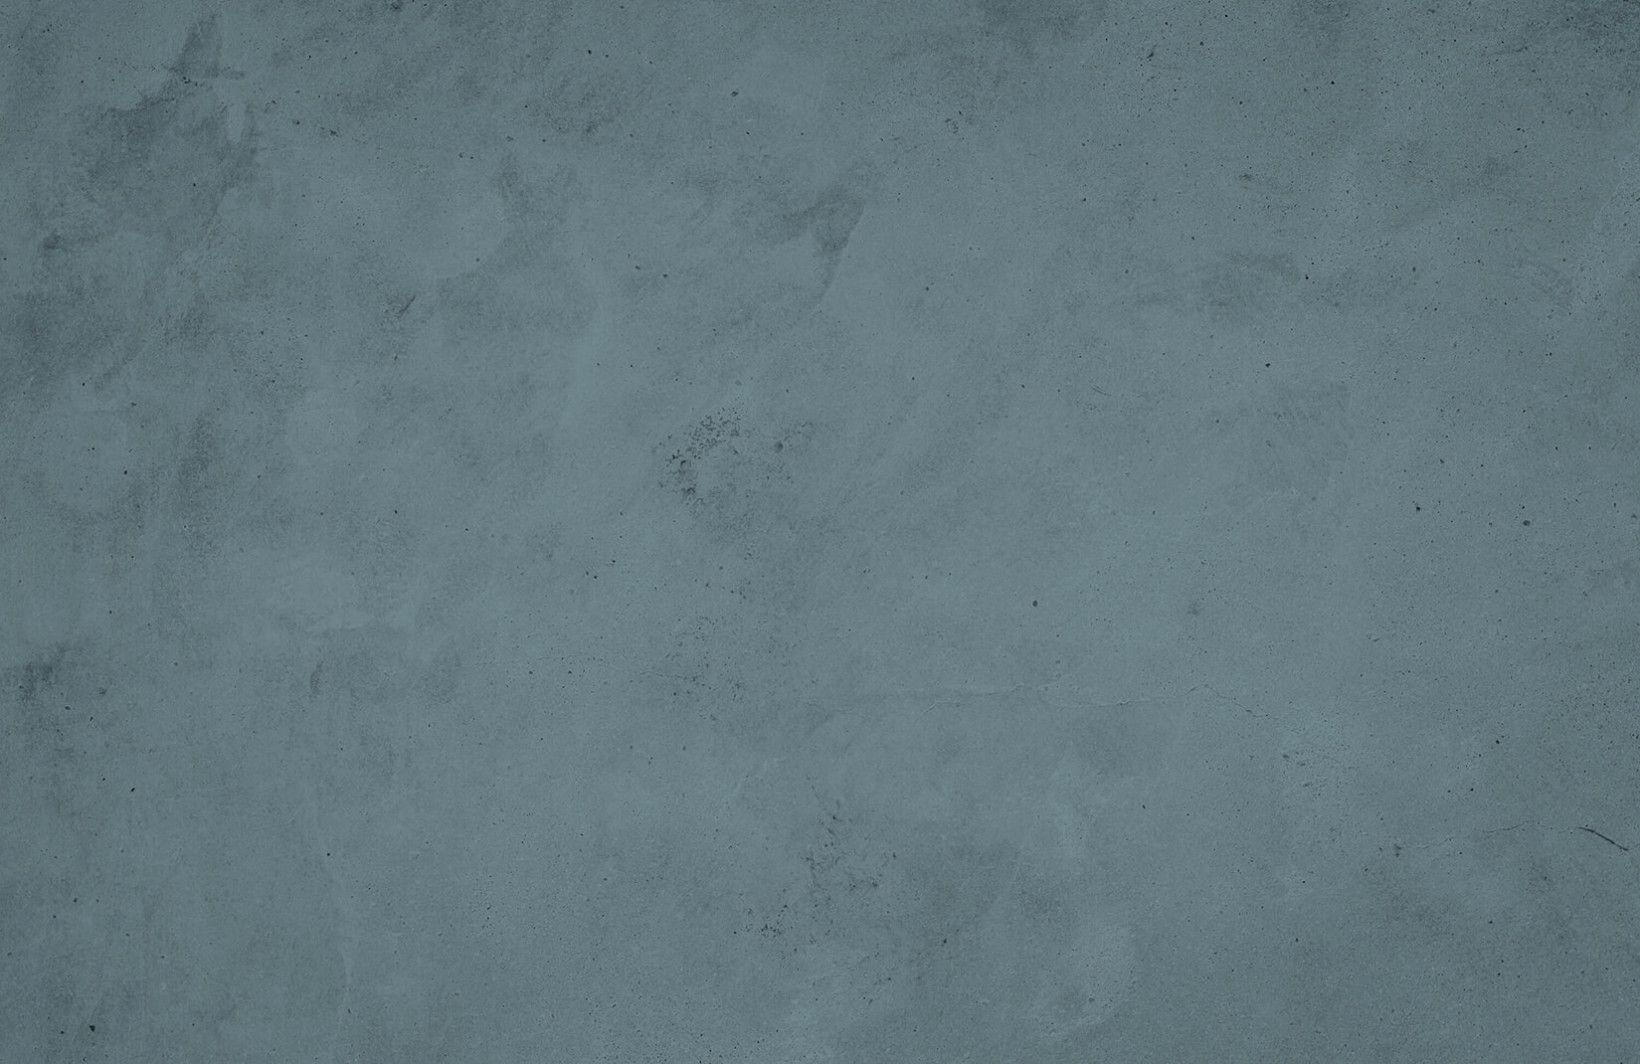 Blue Textured Cement Wall Mural Cement walls, Wall